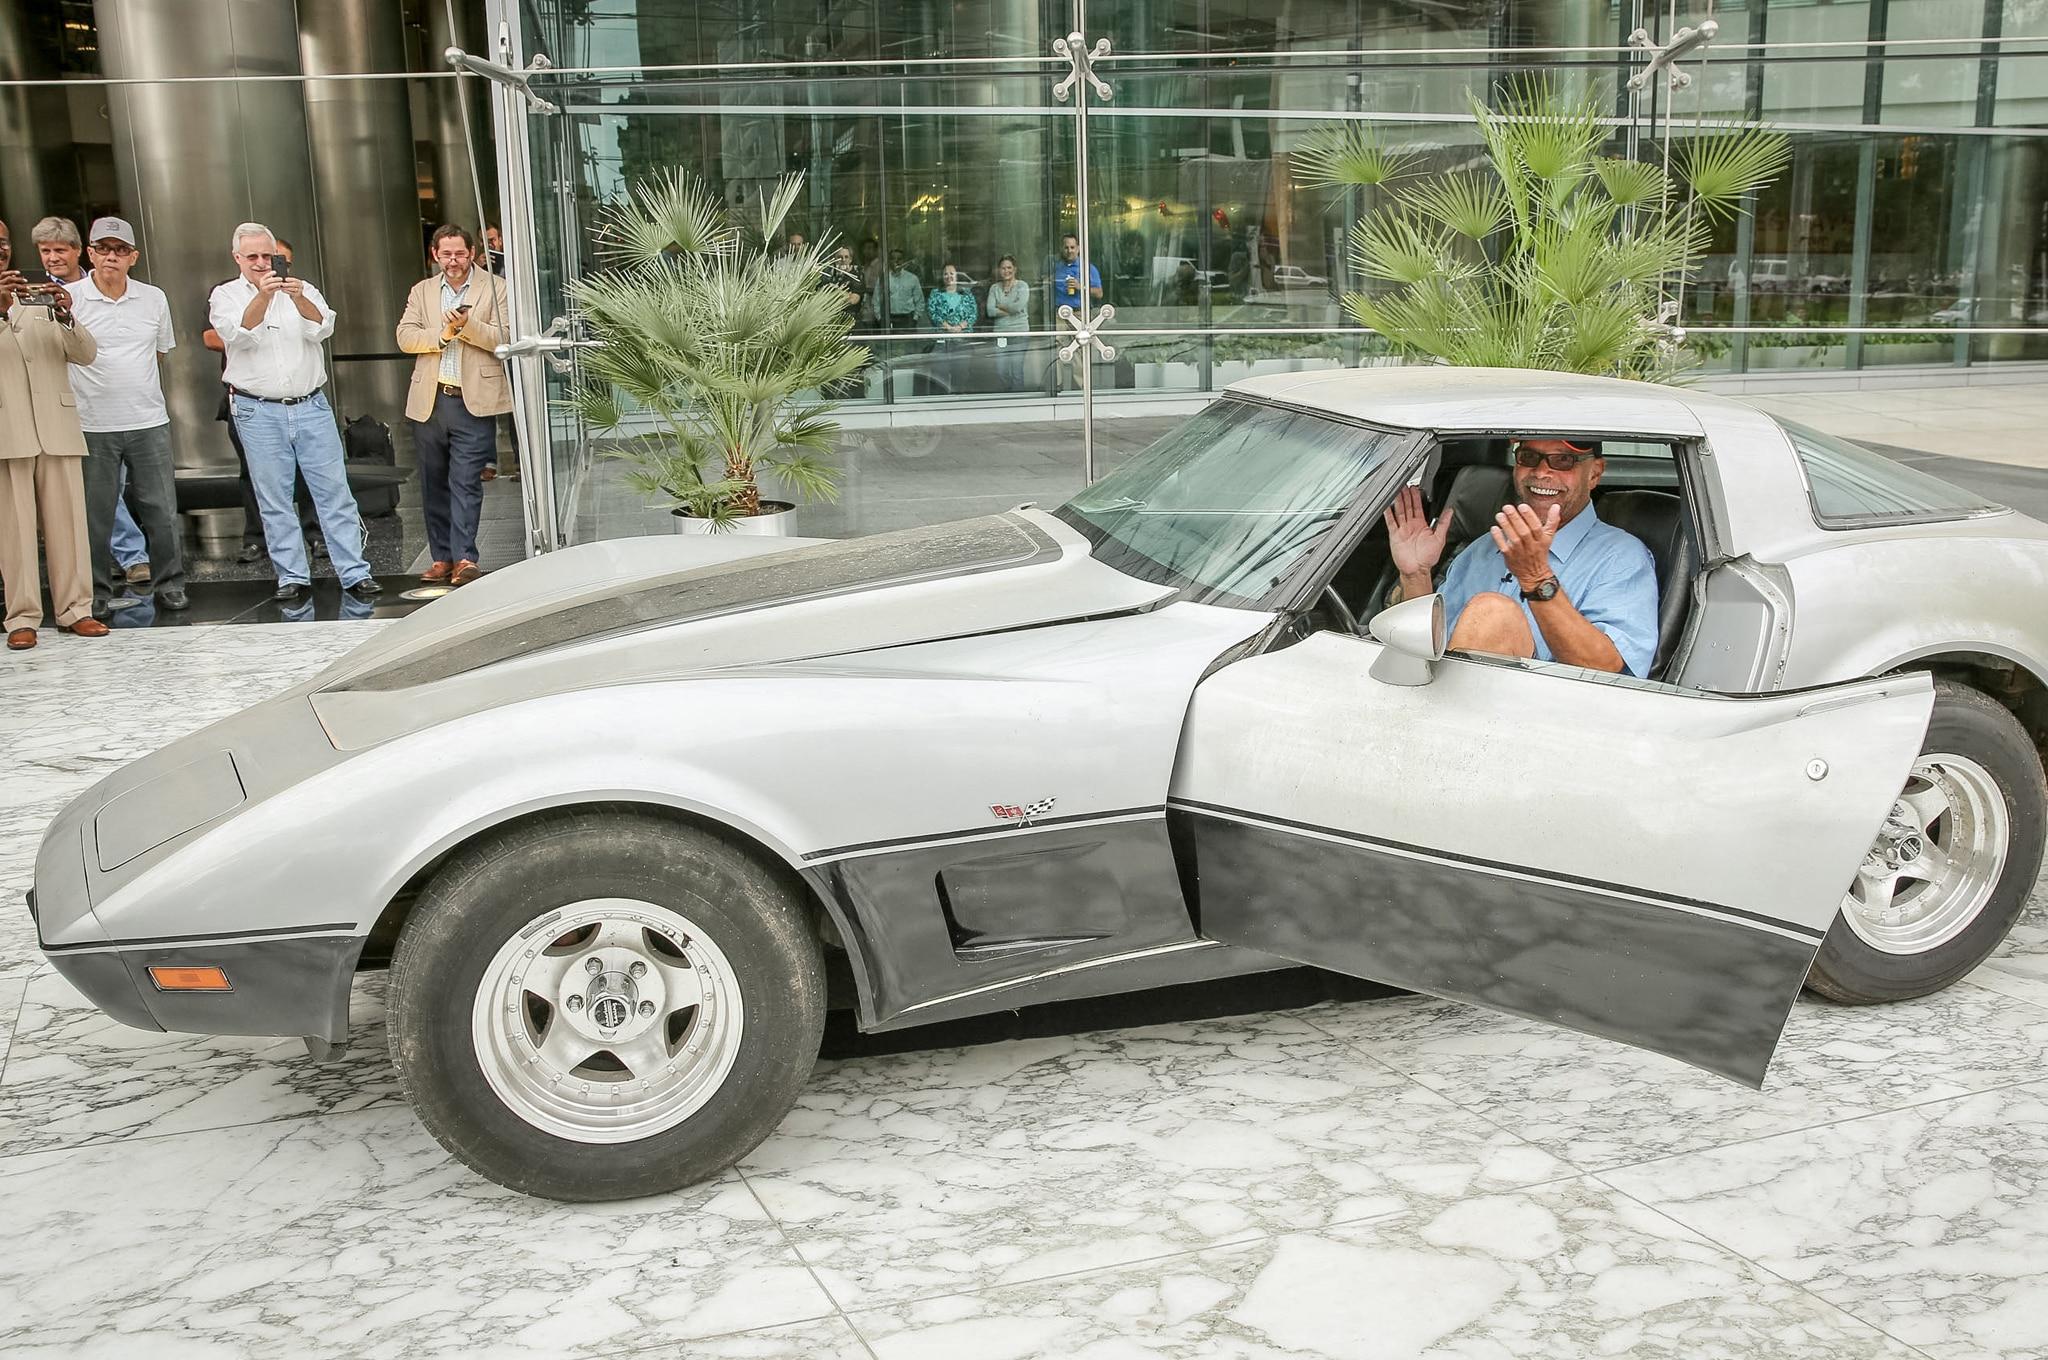 1979 Chevrolet Corvette Reunion With Owner Profile1